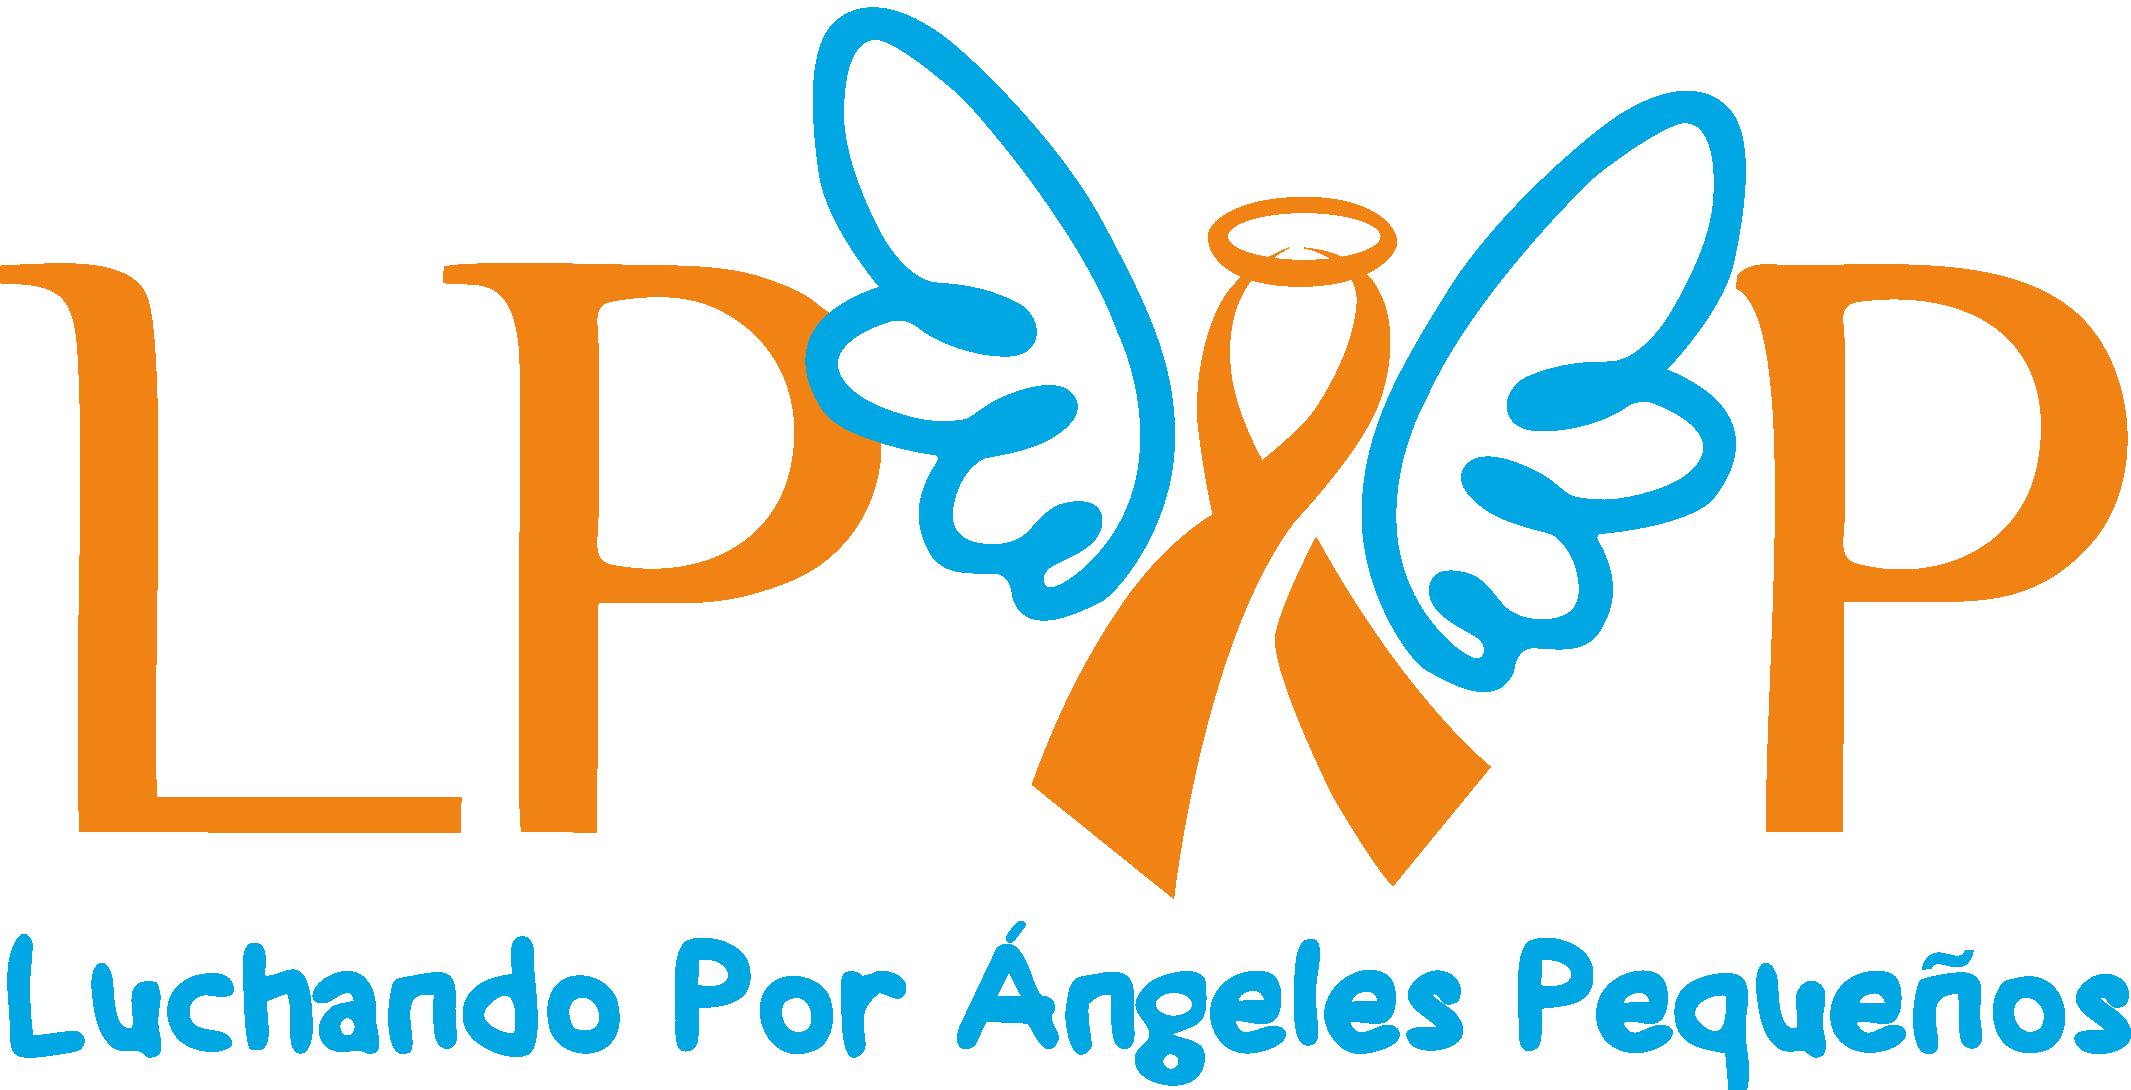 Luchando por Ángeles Pequeños LPAP